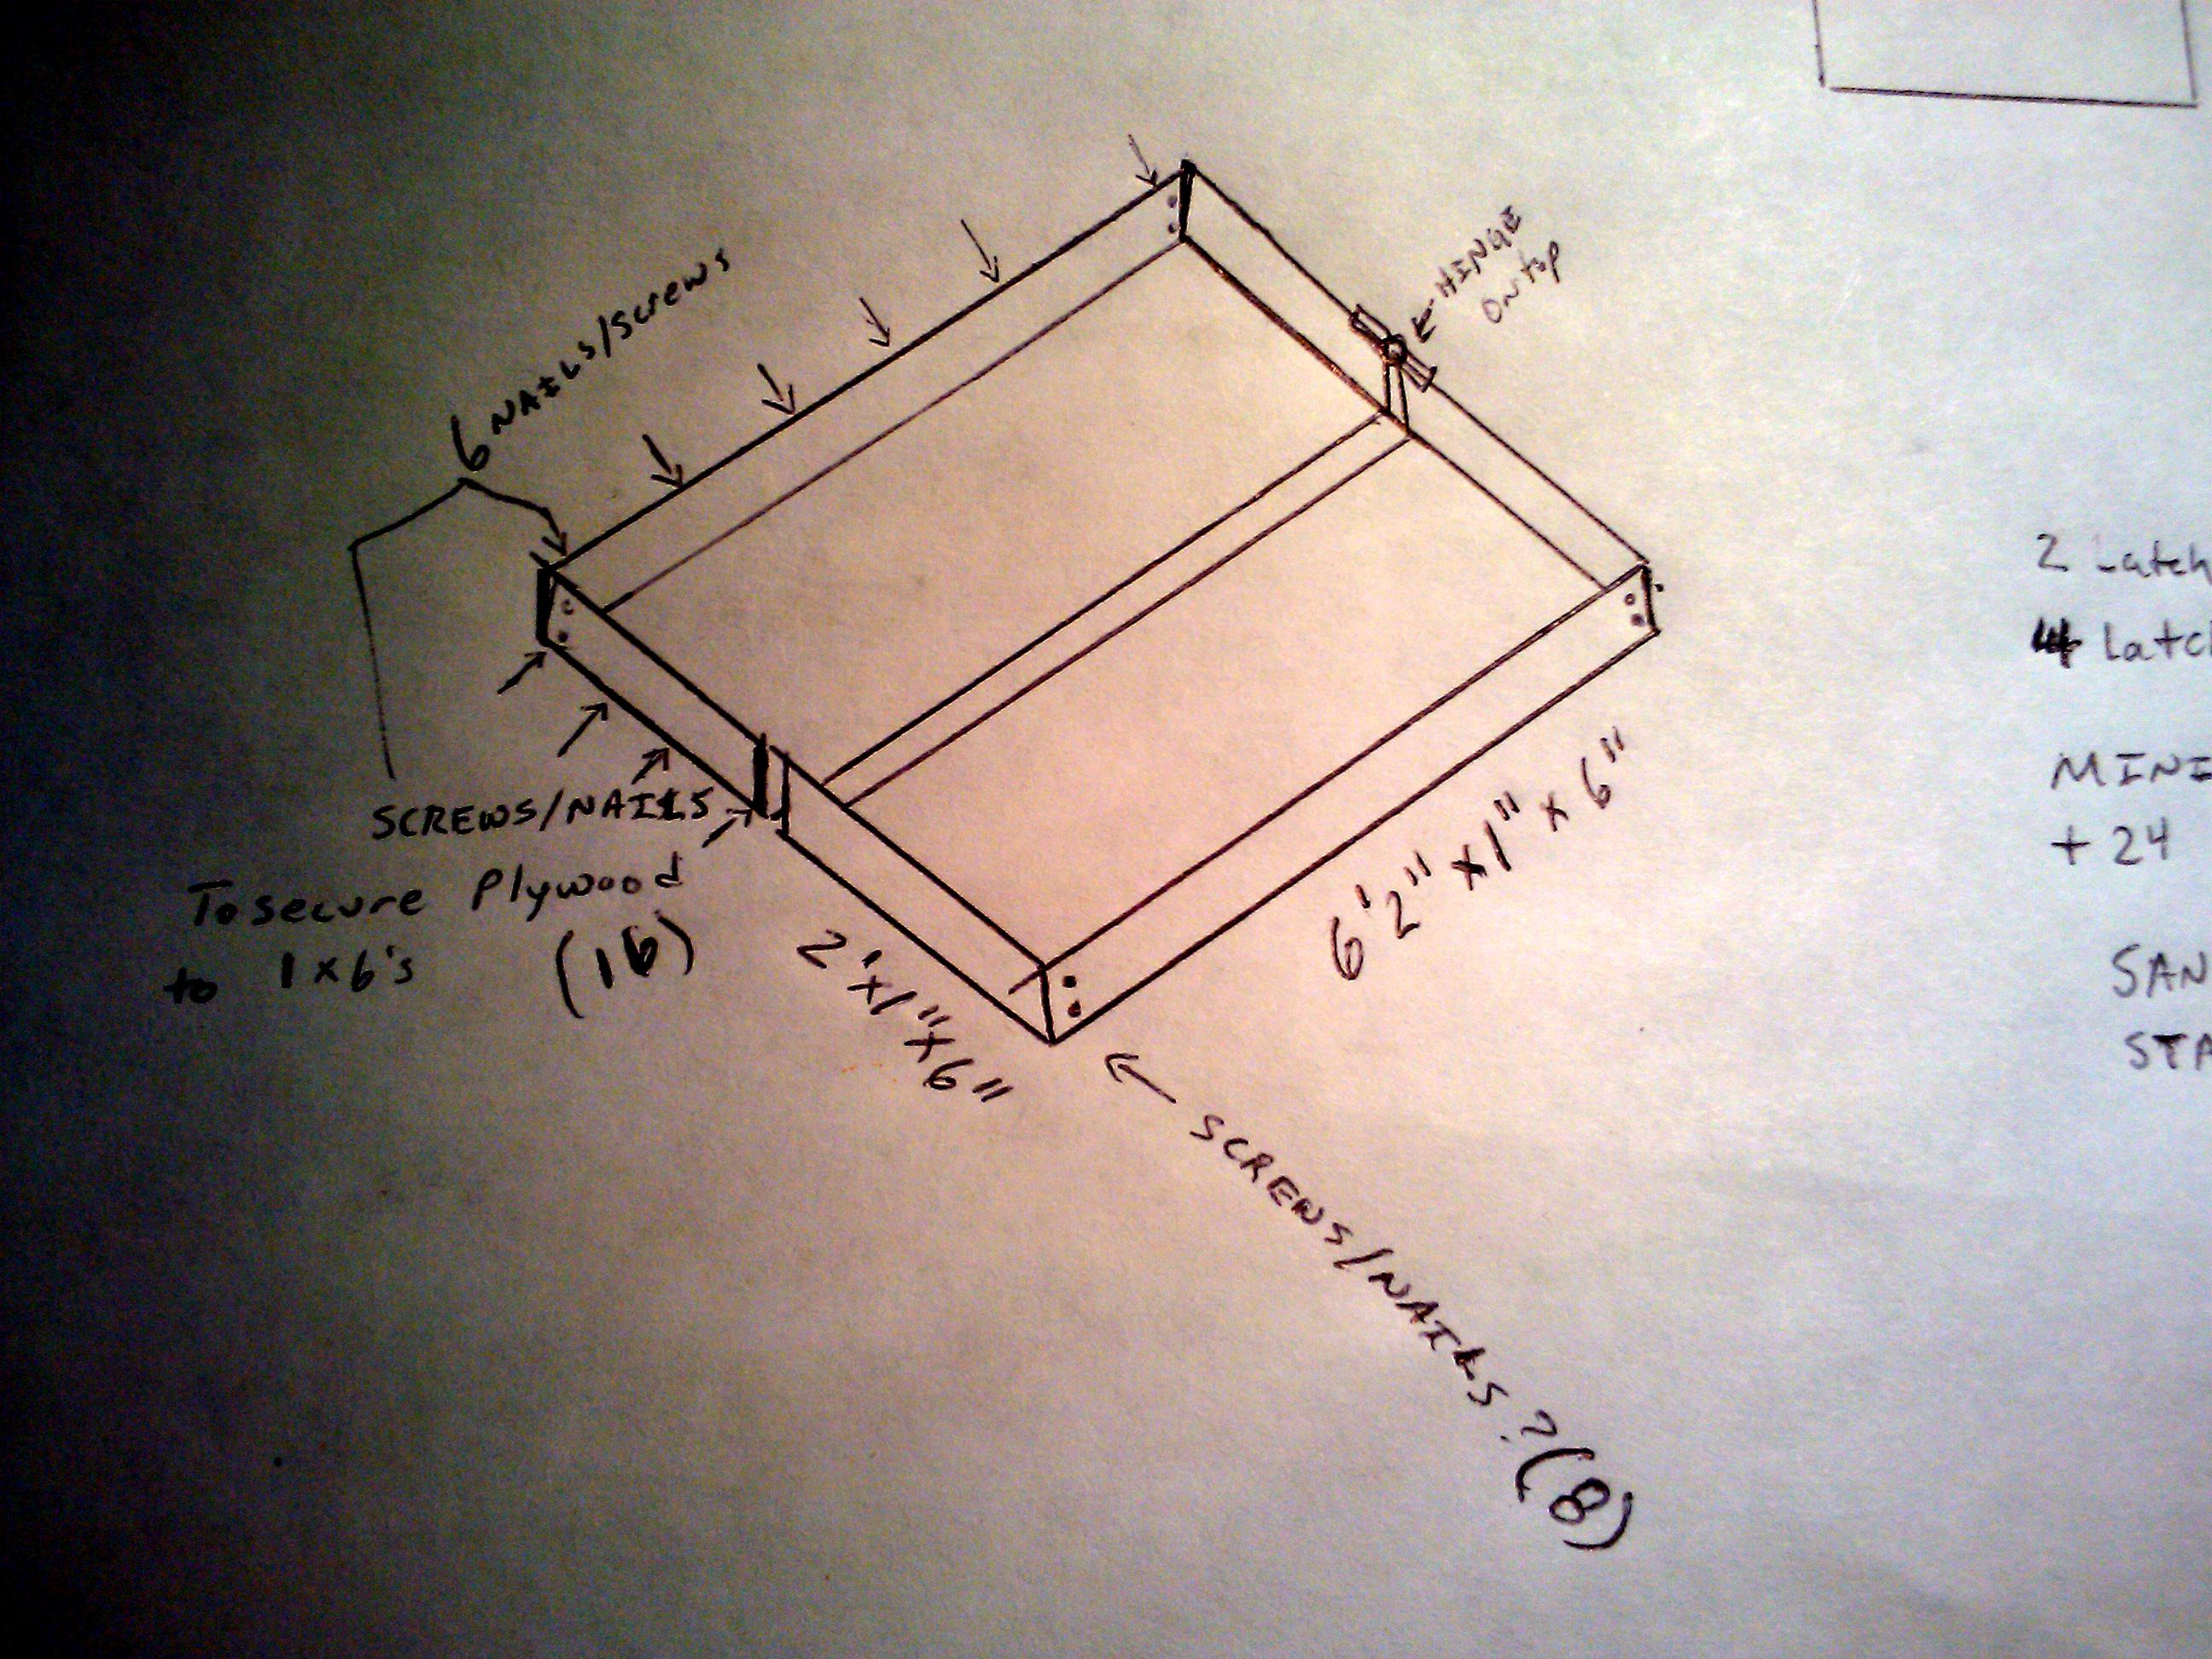 Base, Buildings, Conversion, Hobby, Portable Game Table Design2, Set, Terrain